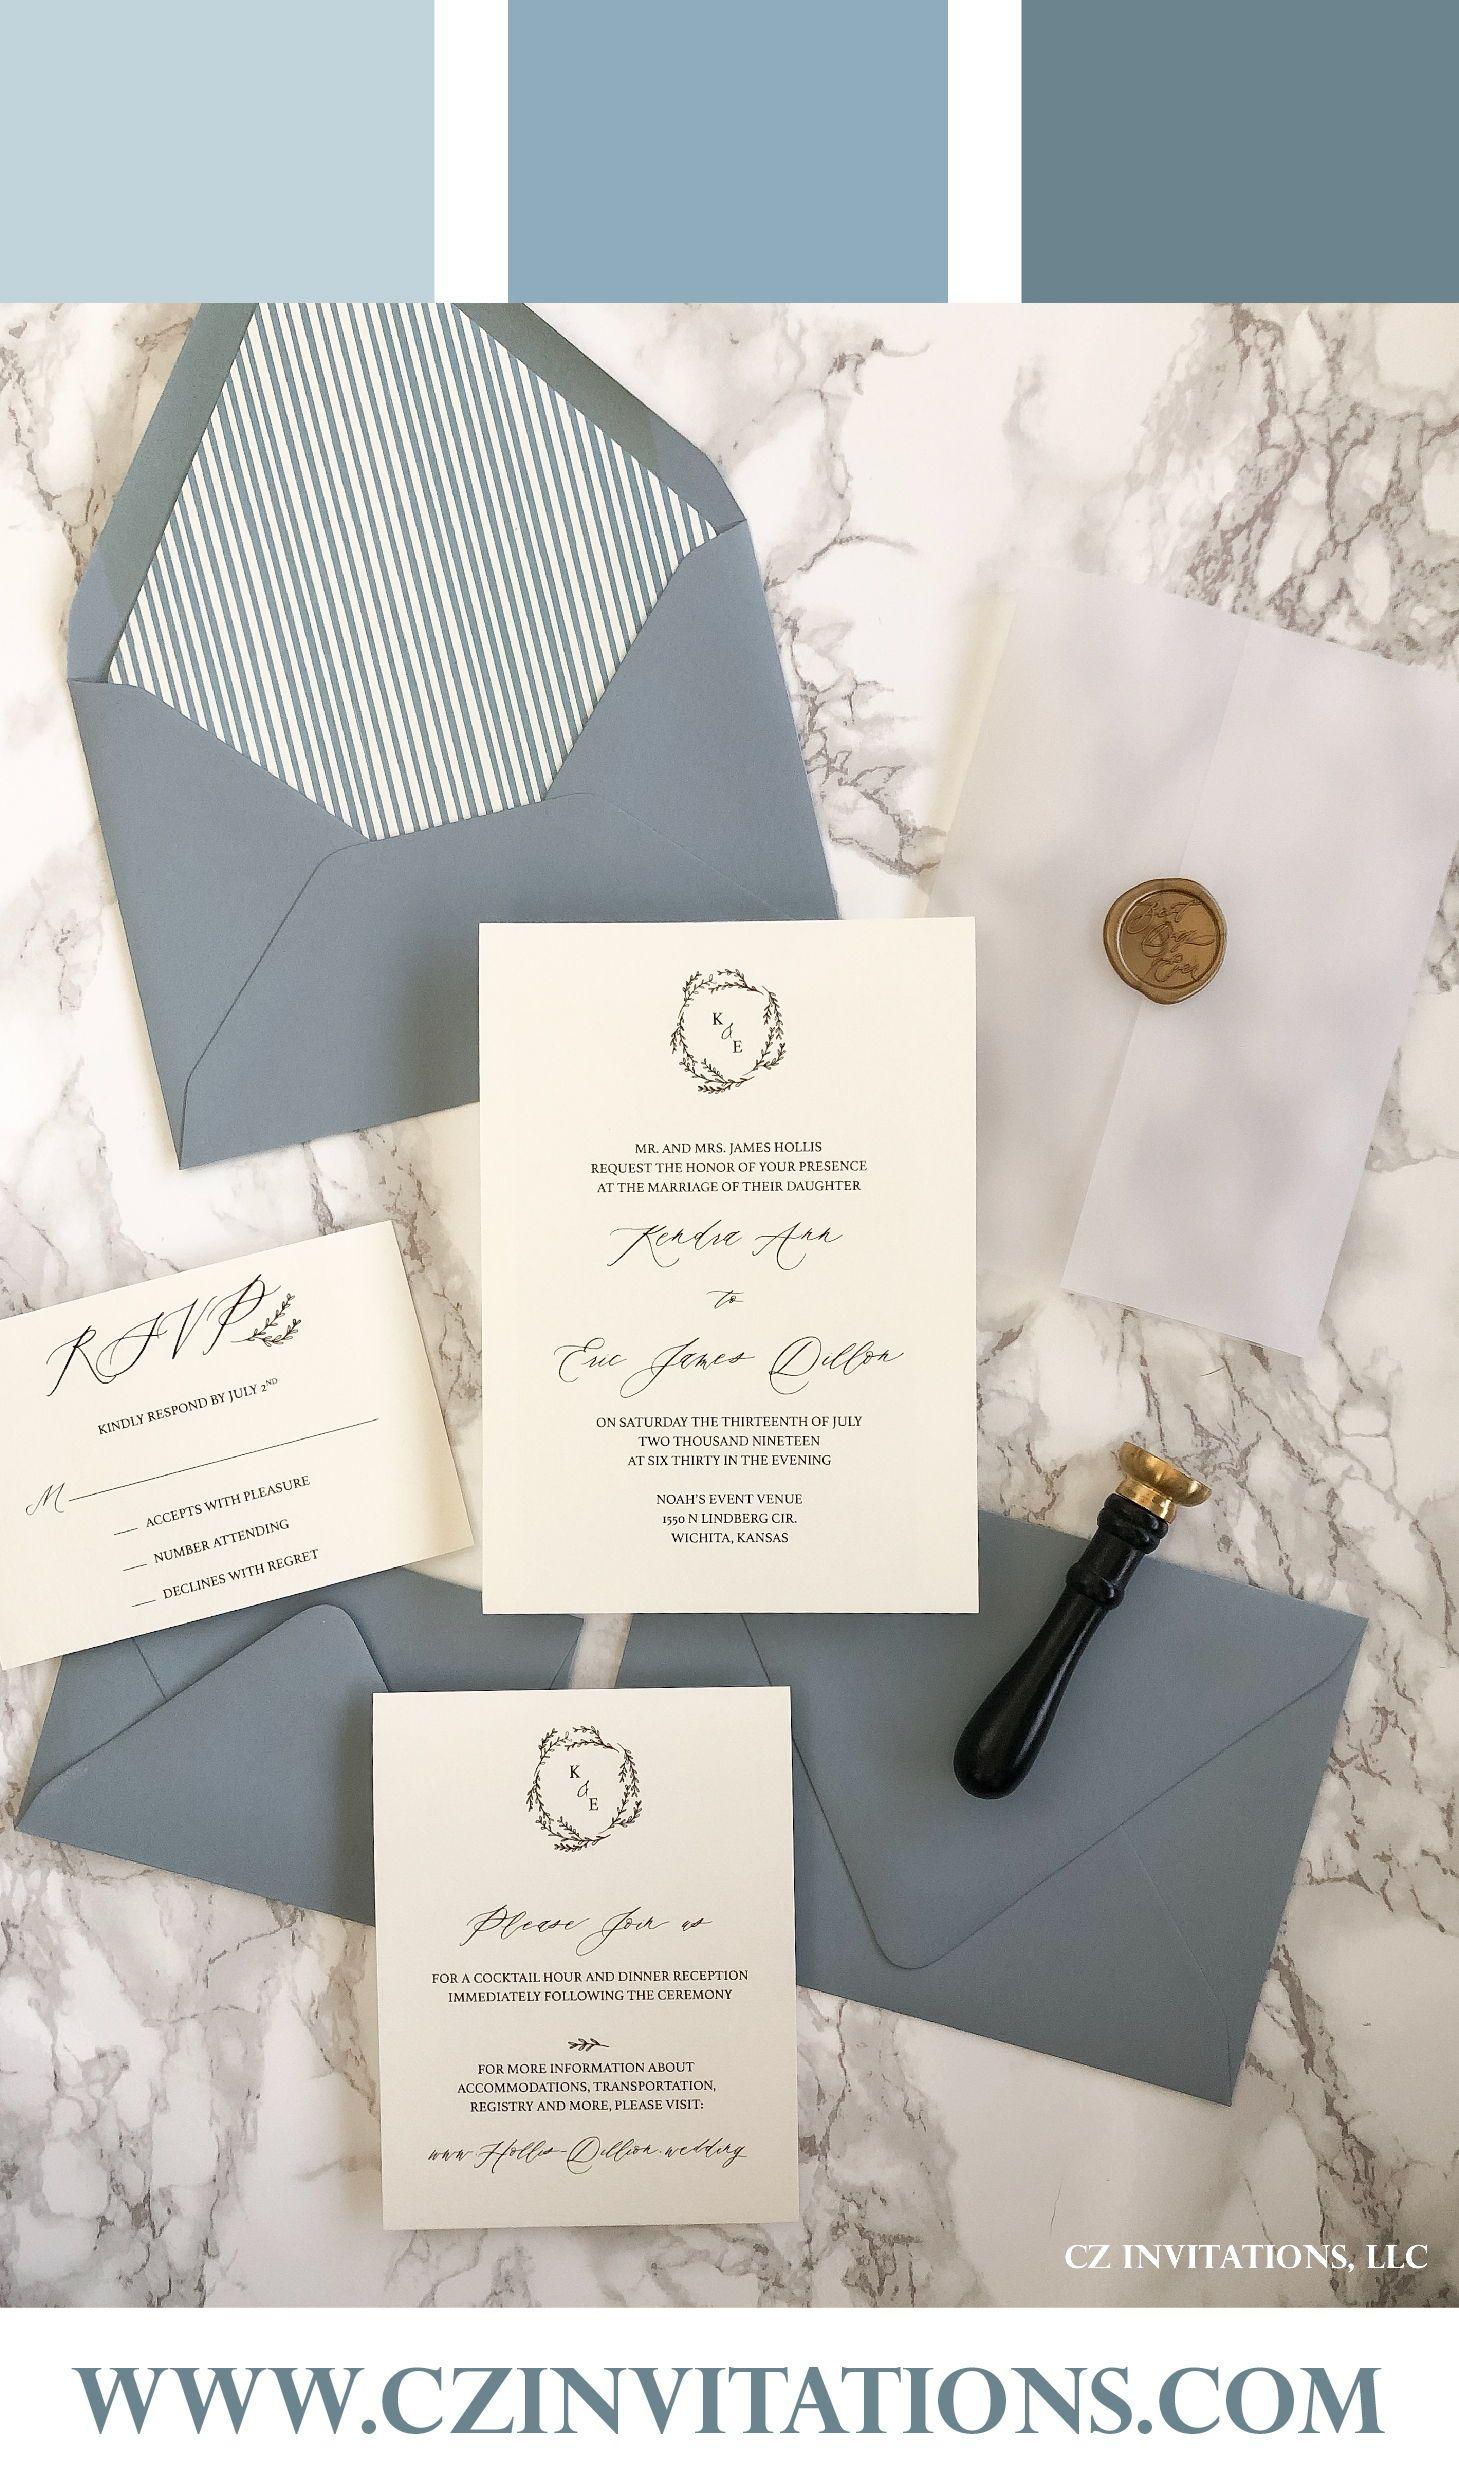 Dusty Blue Vellum Wedding Invitation Vellum Wedding Etsy In 2020 Dusty Blue Weddings Wedding Invitations Glitter Invitations